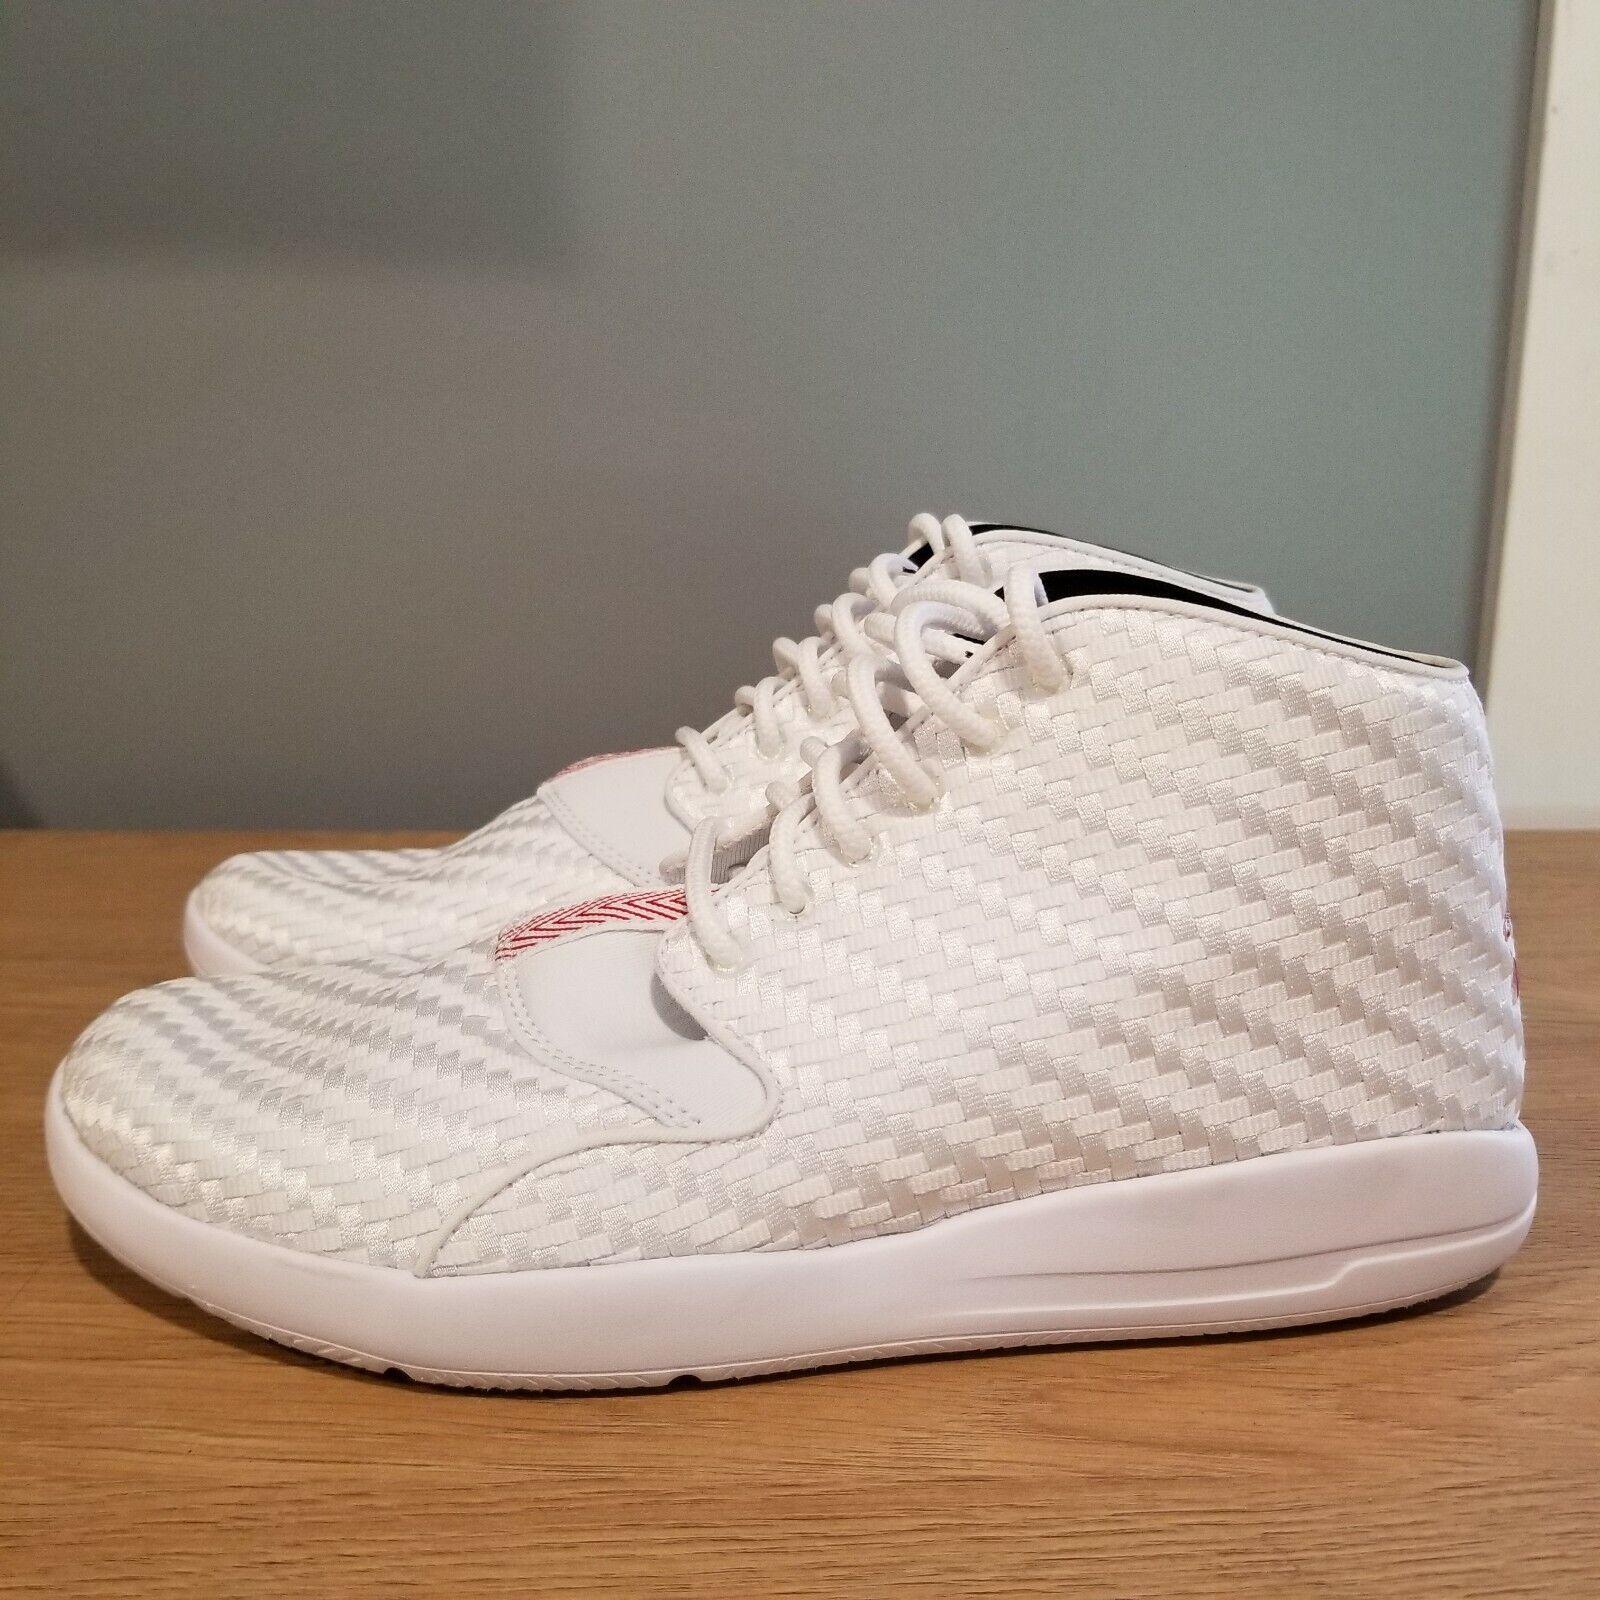 Nike Jordan Eclipse Chukka Mens Size 10